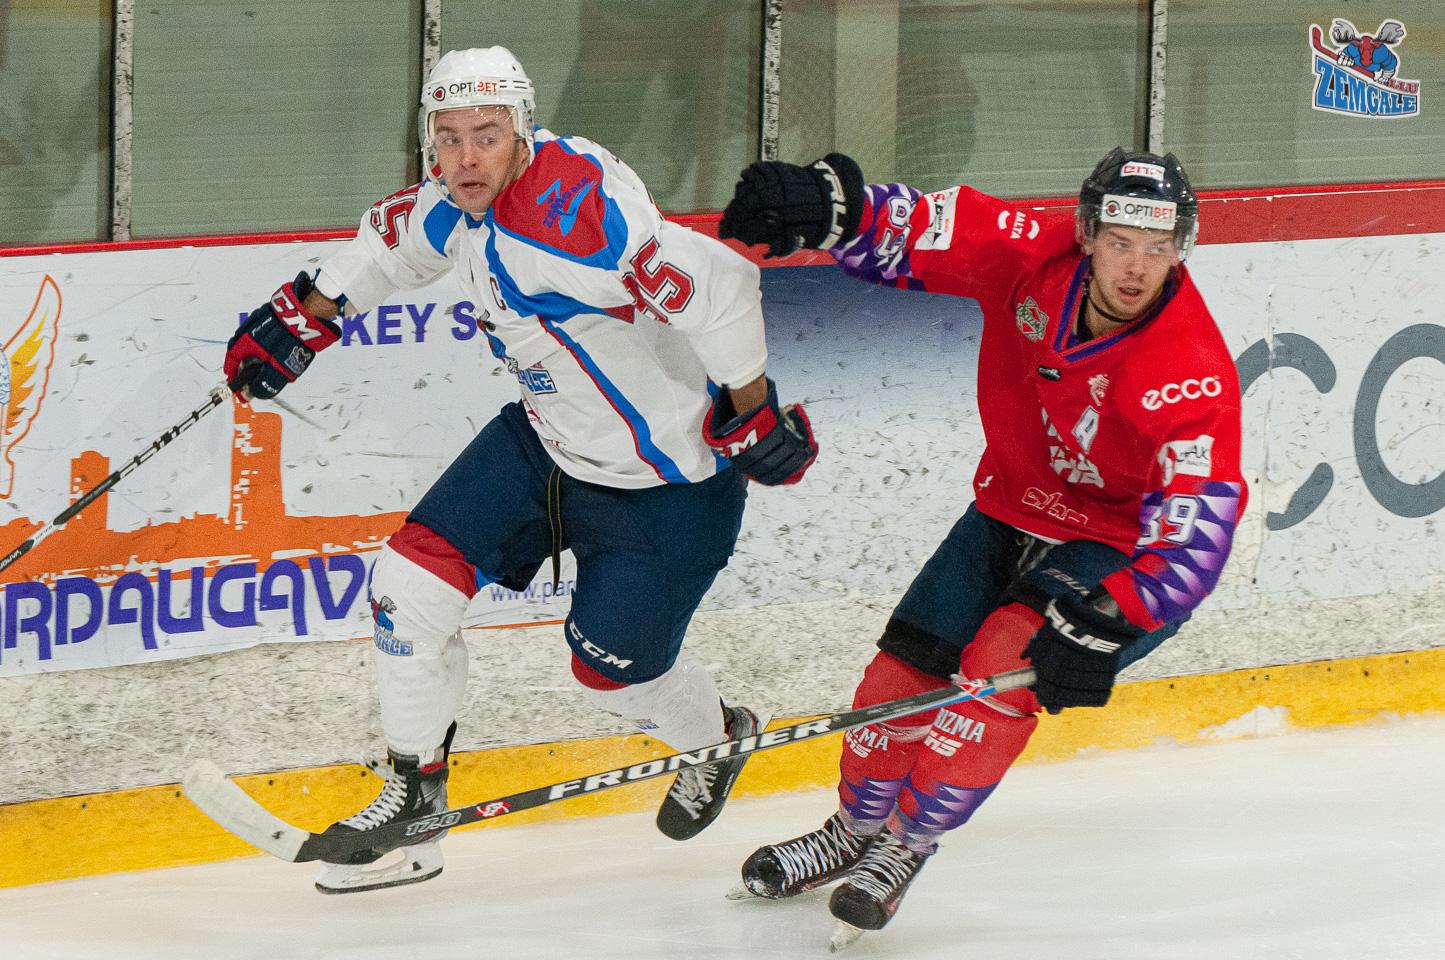 Divi hokejisti pie laukuma borta